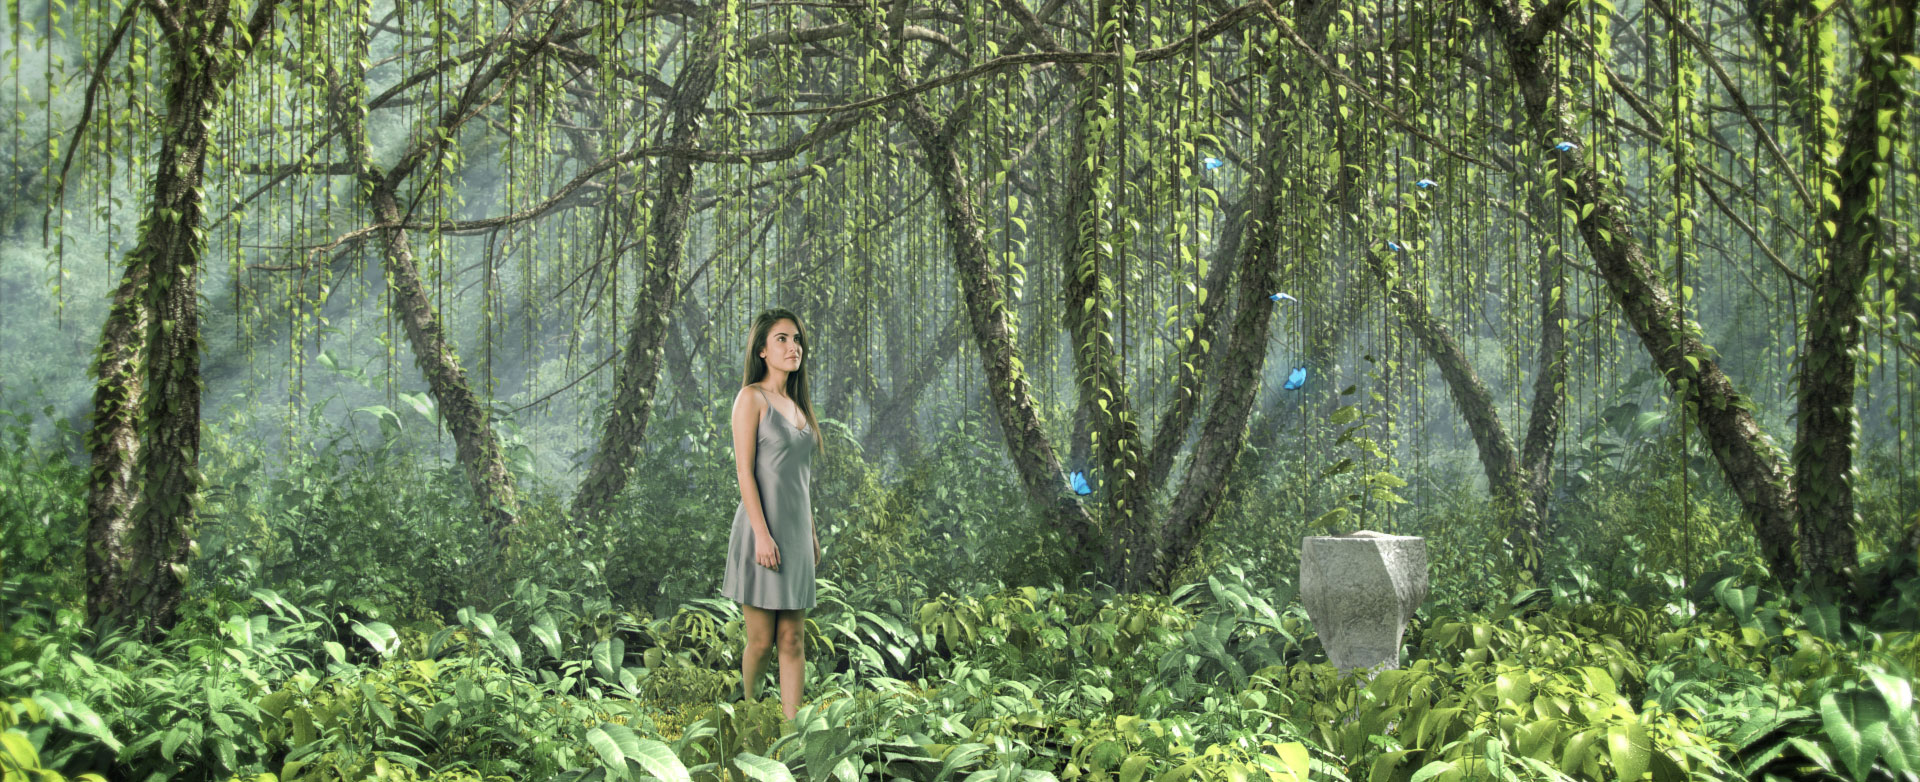 visual art factor G sesderma visualart virtualart, agencia publicidad anuncio spot valencia